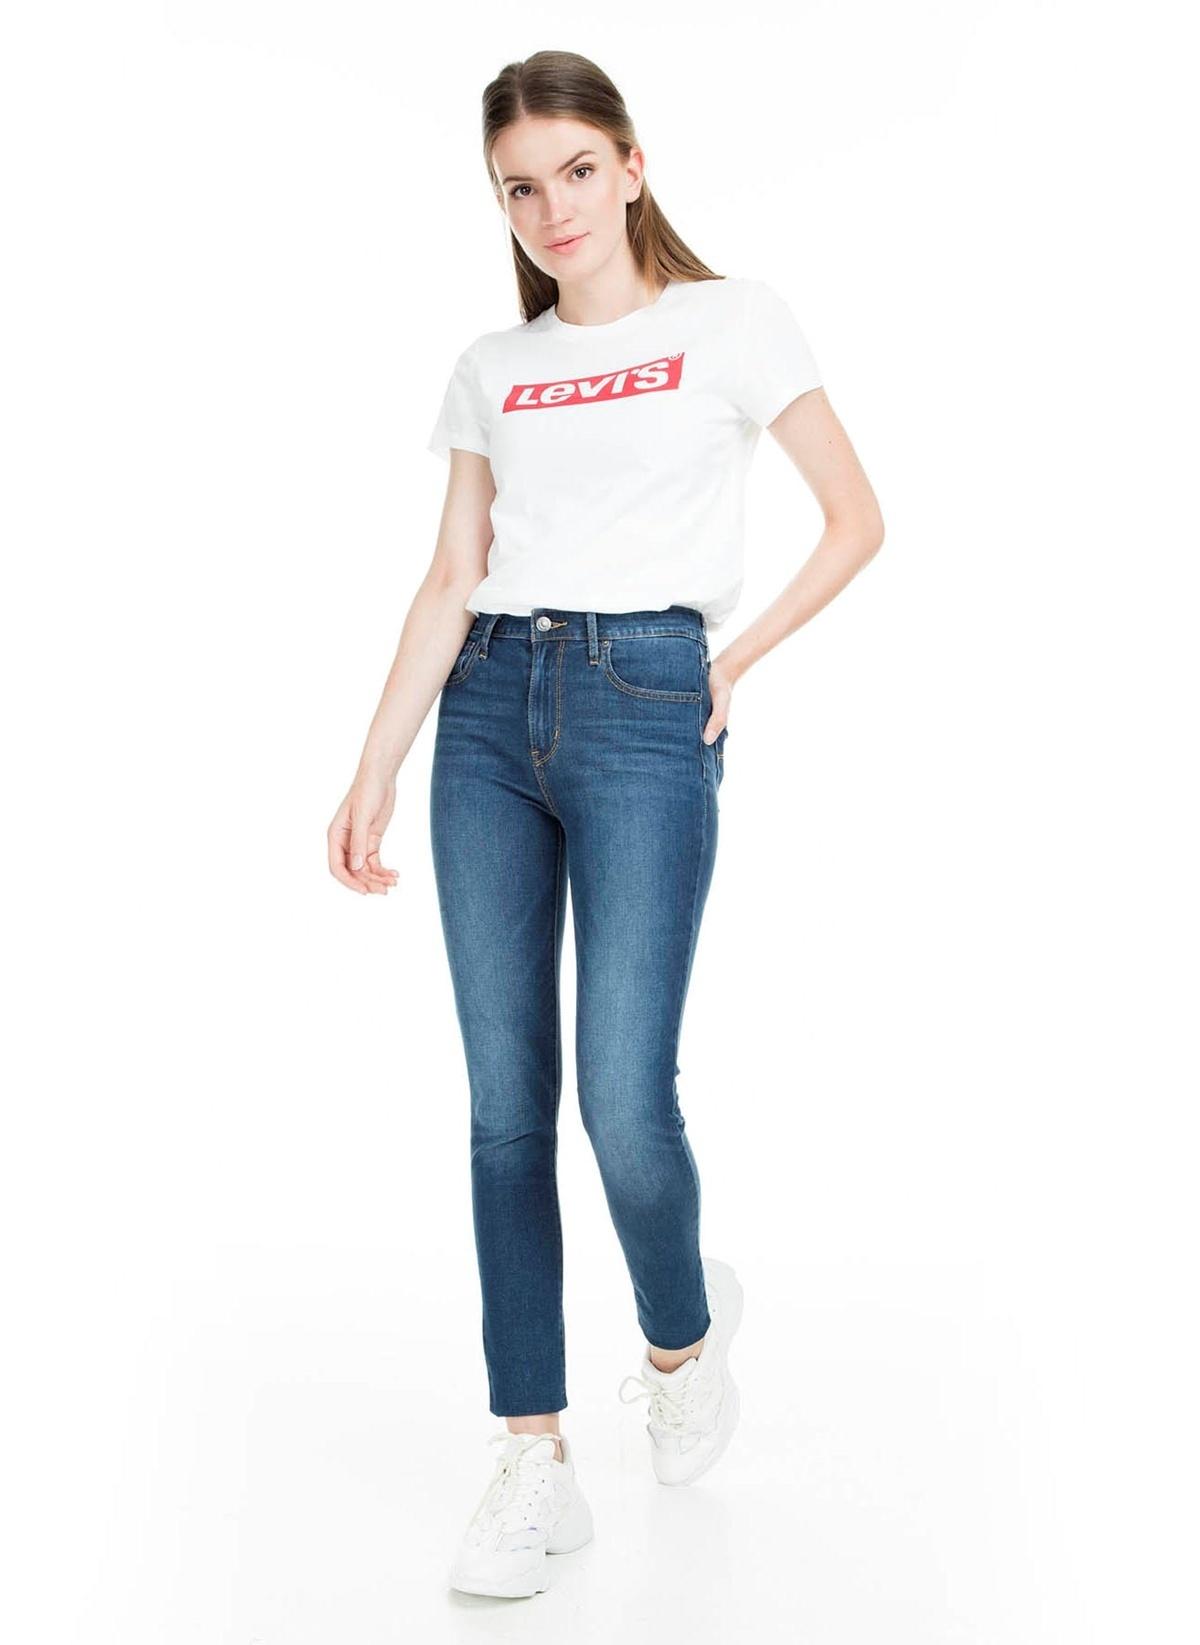 Levis®  Levi's® Jean Pantolon 18882-0185-Kadın–Kot-Pantolon